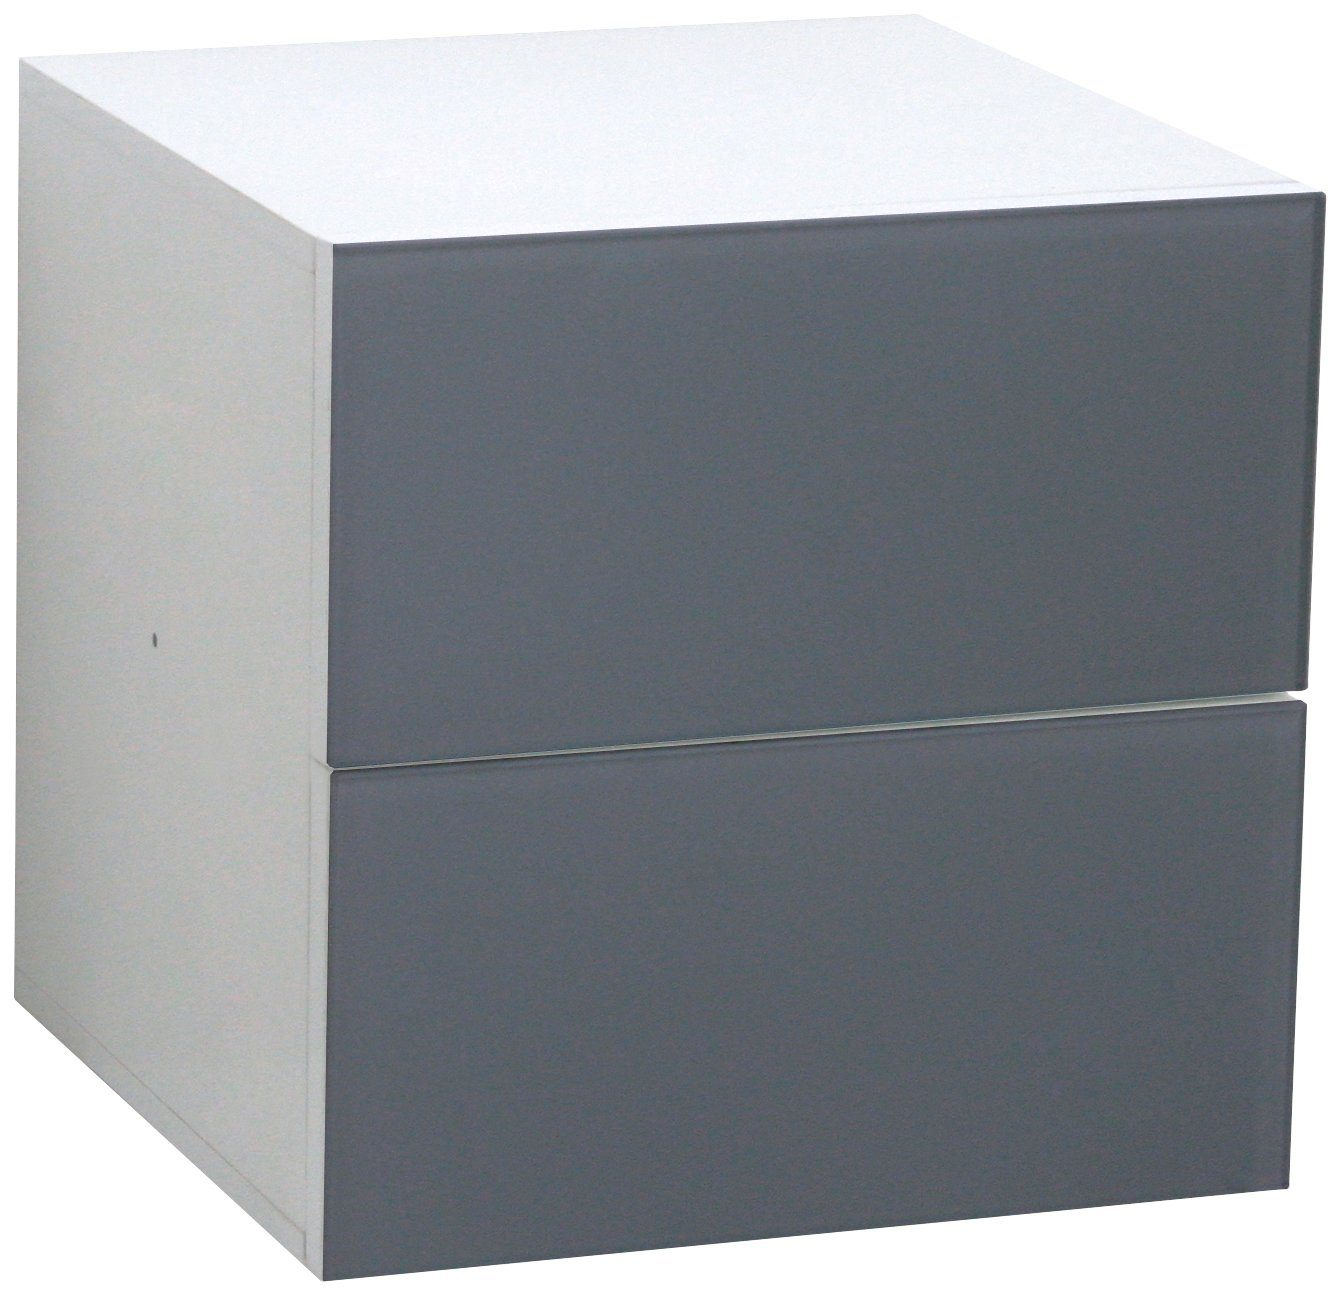 PHOENIX Schubladenelement »Atlanta«, B/H/T: 34 x 34 x 38 cm